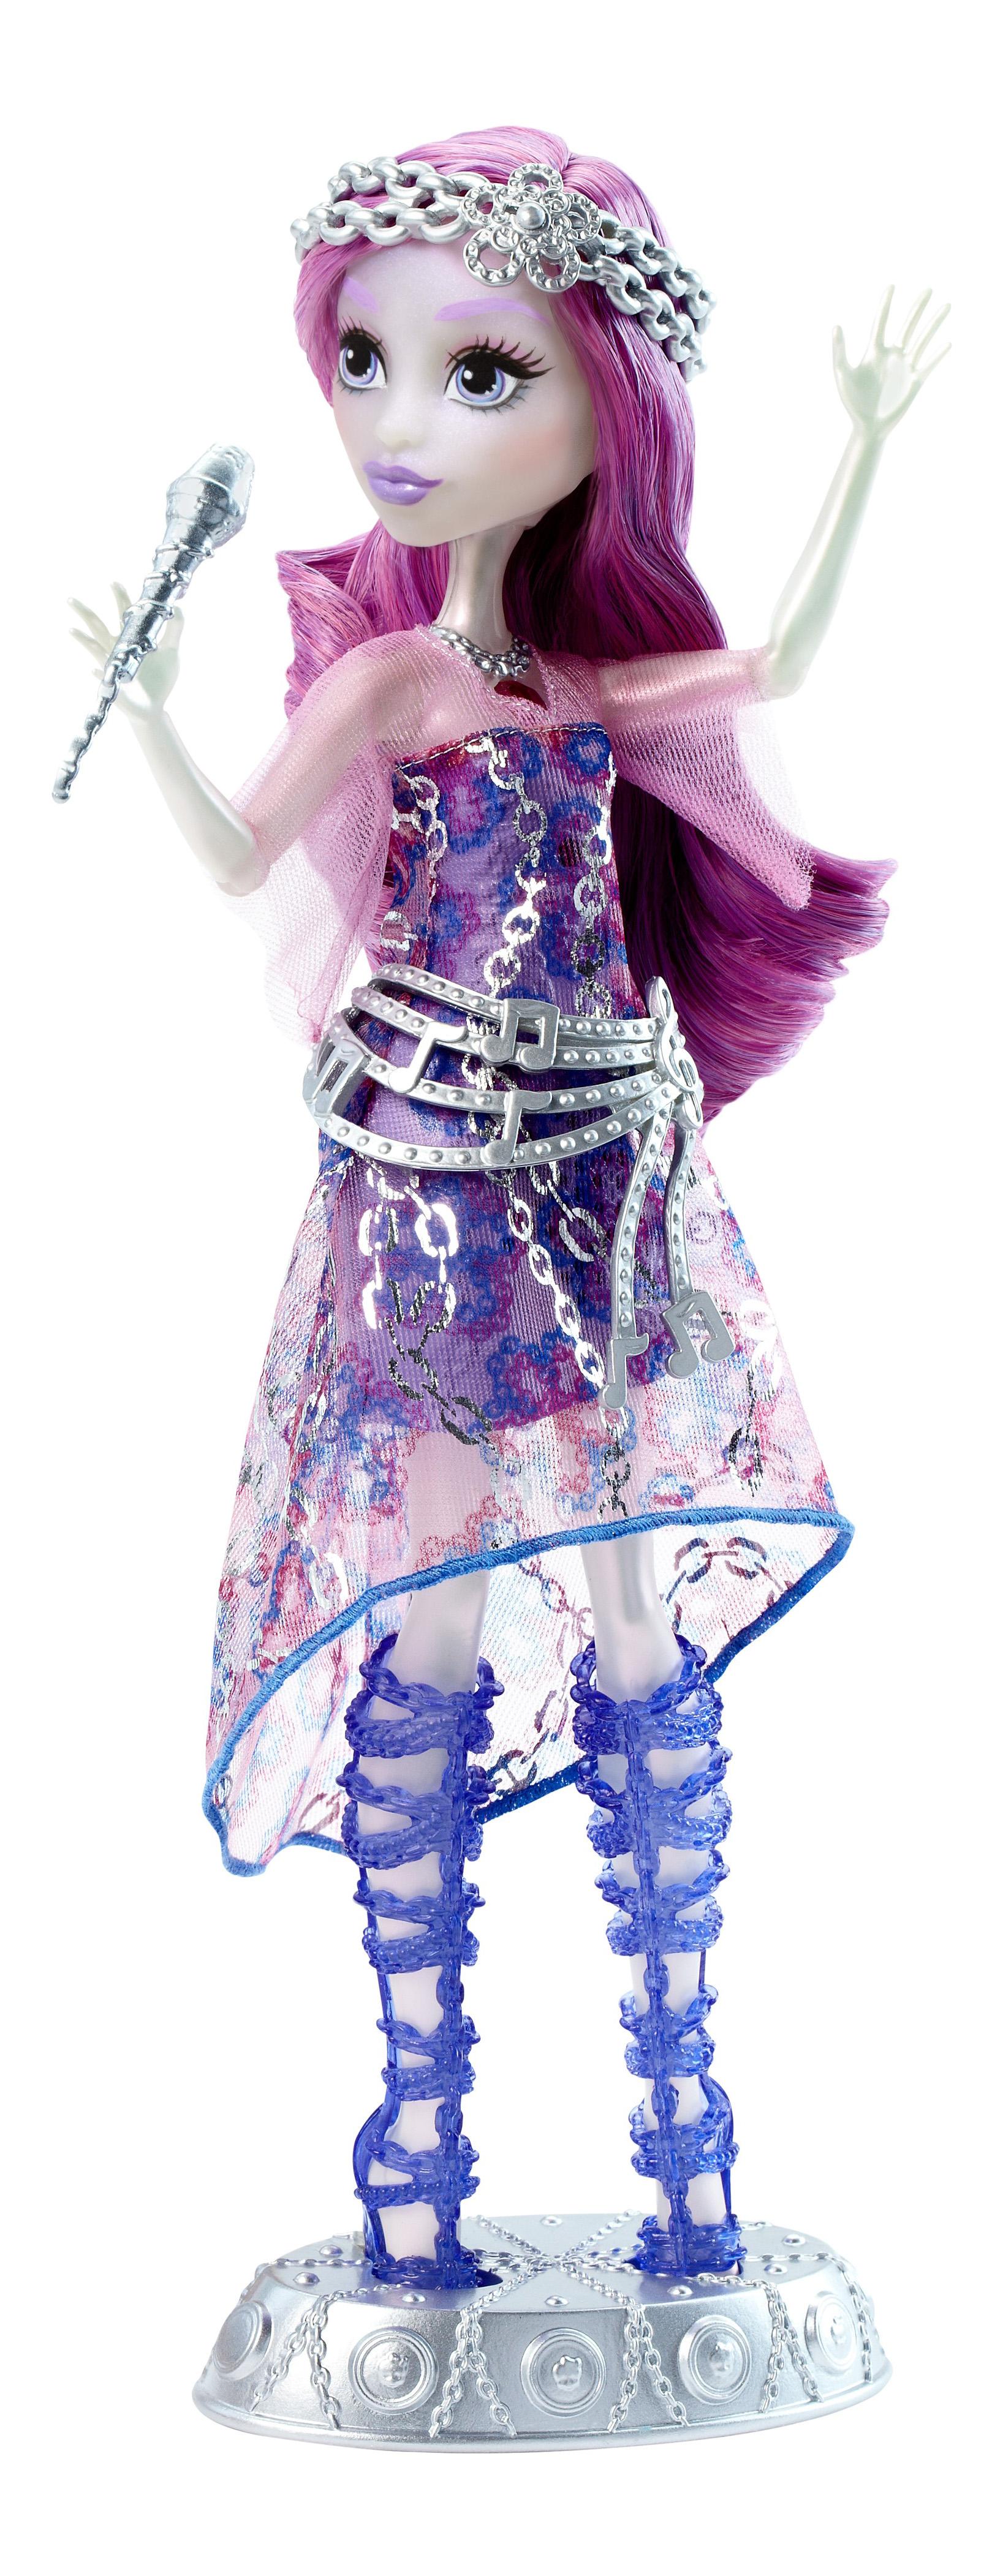 Купить Кукла Monster High Поющая спектра, Куклы Monster High